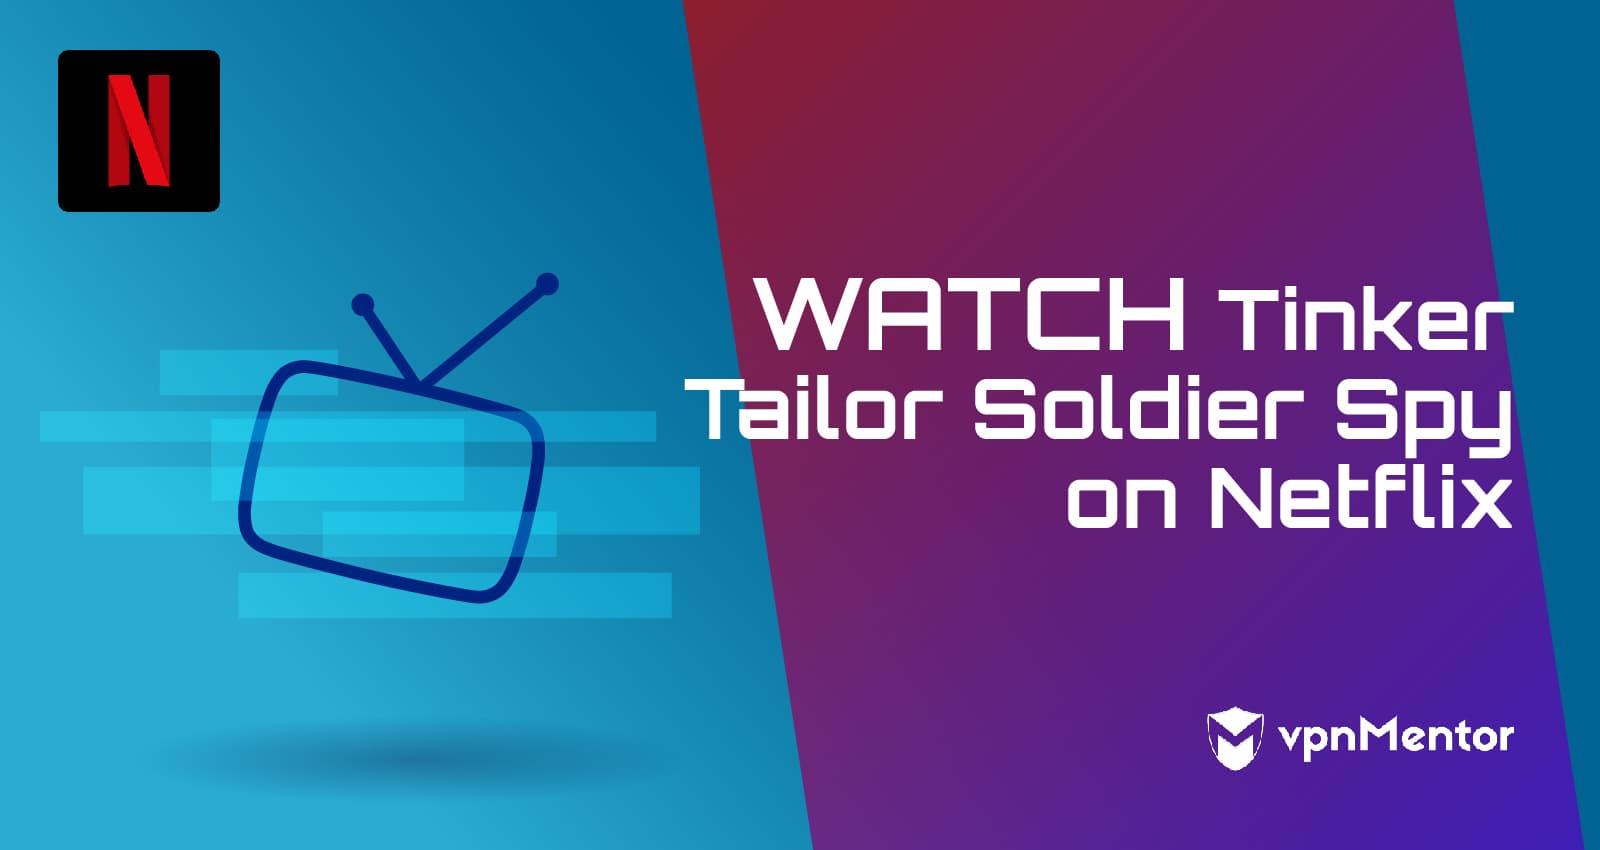 Watch Tinker Tailor Soldier Spy on Netflix